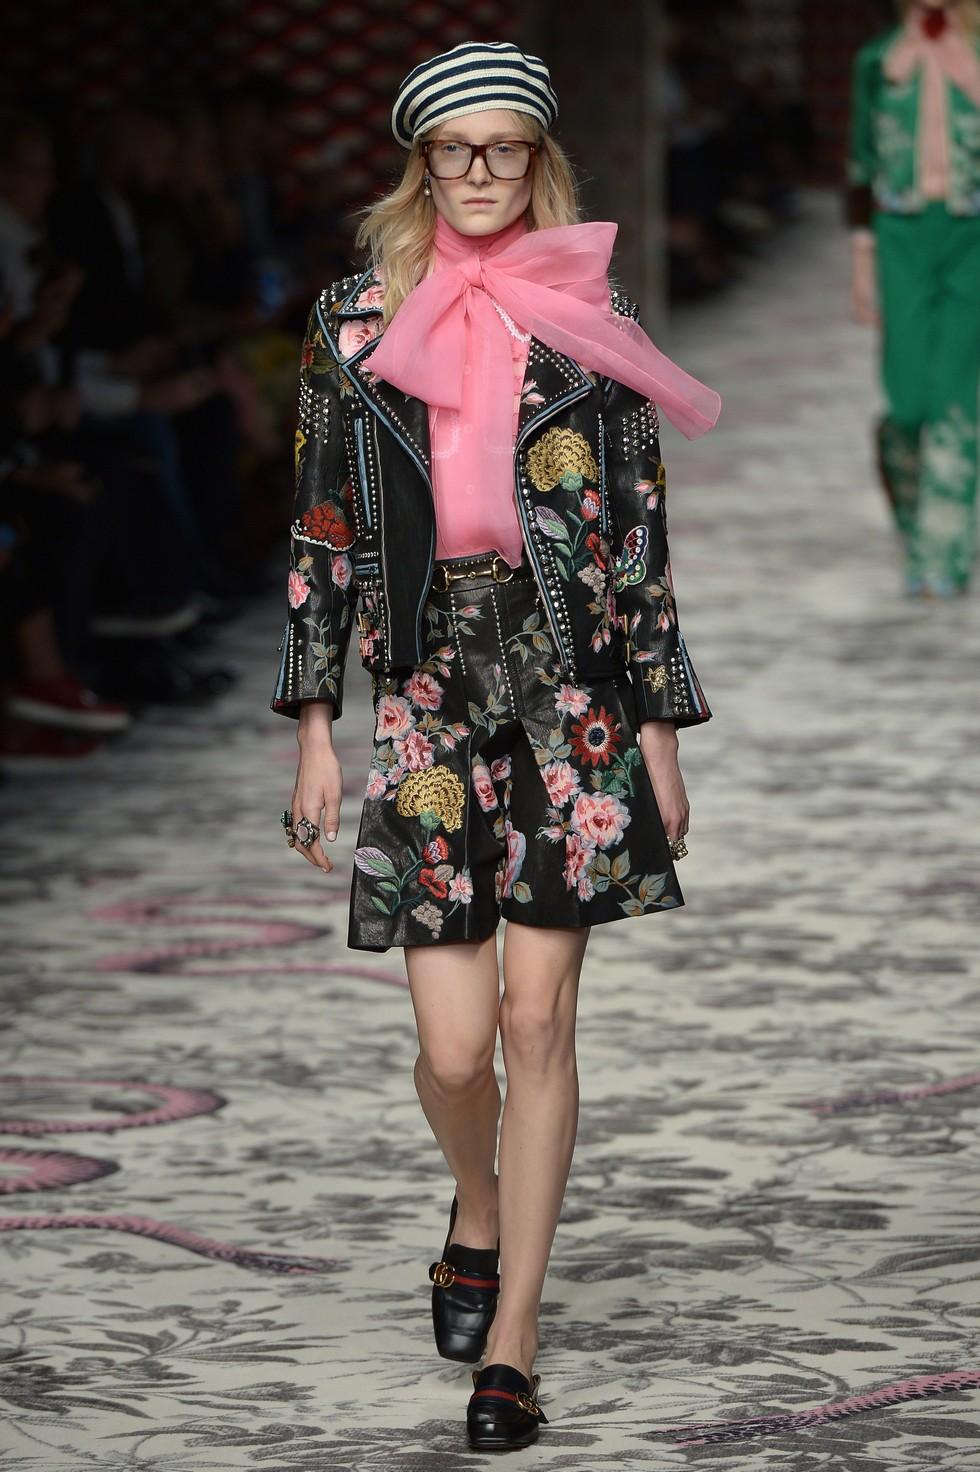 Milan Fashion Week 2016 News: Inspirations behind Gucci ...